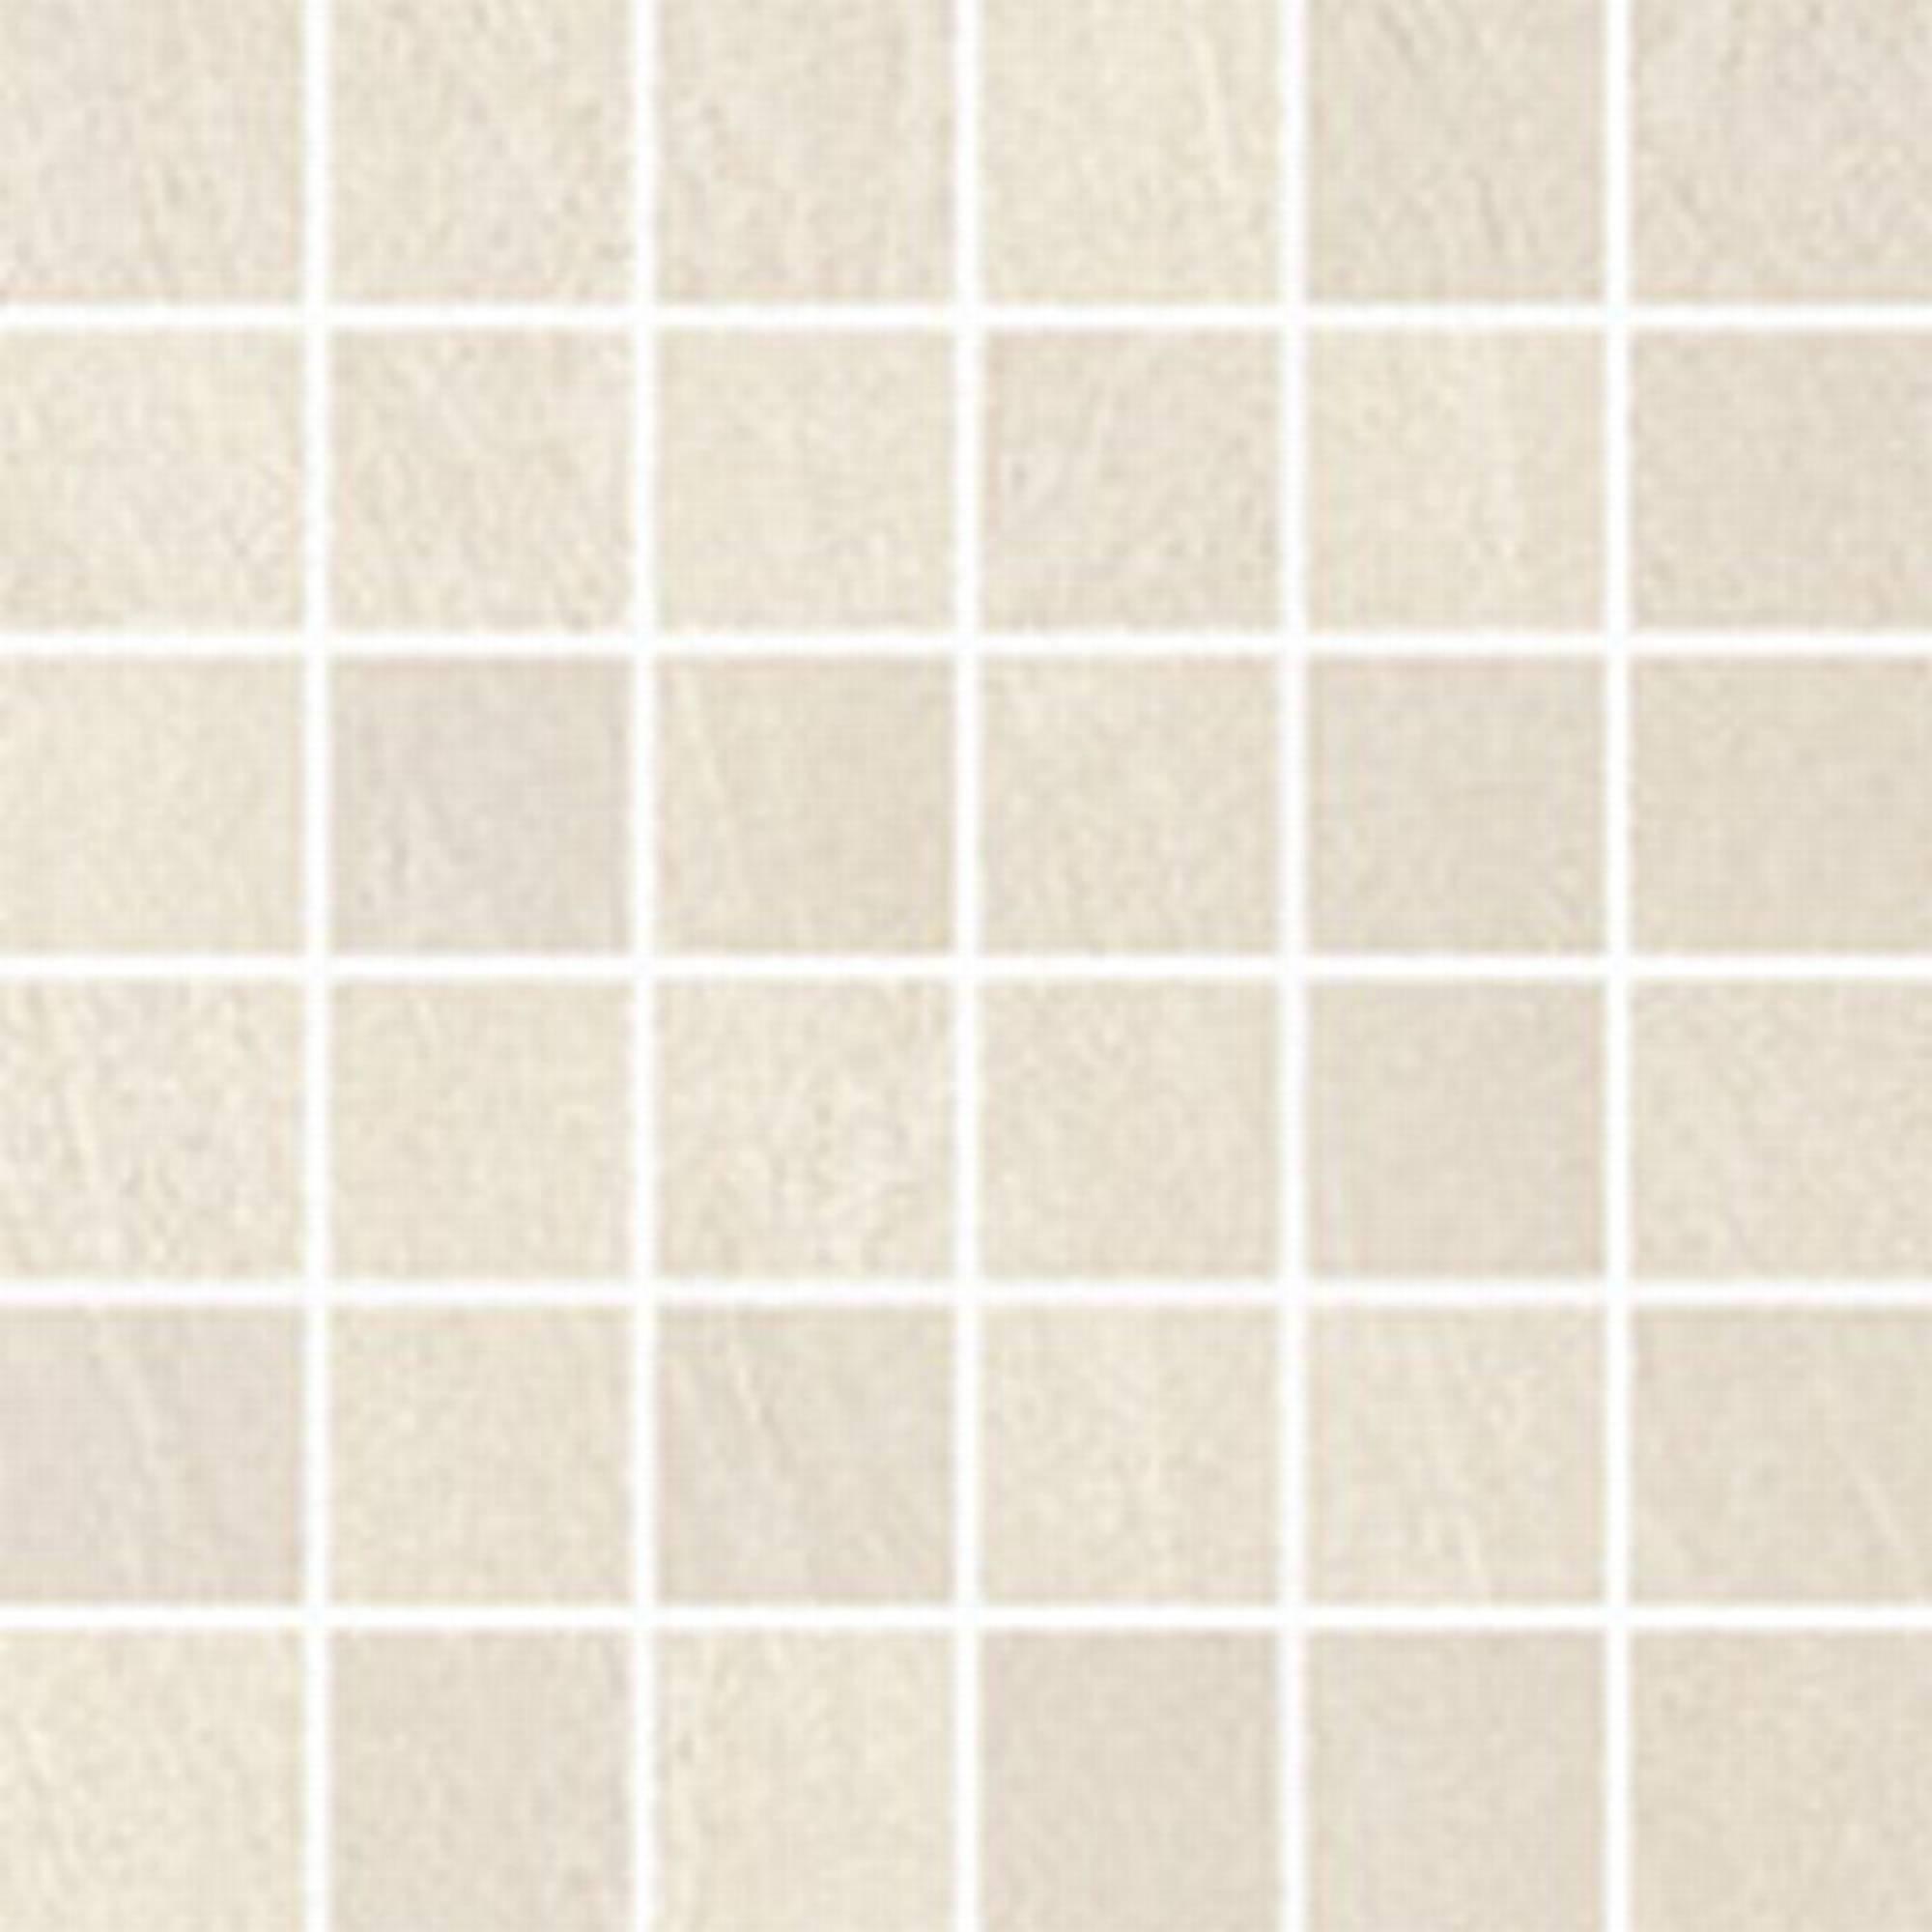 Villeroy & boch Aspen tegelmat 0.5 x 0.5 cm. blok 30 x 30 cm.a 11 stuks, creme-wit